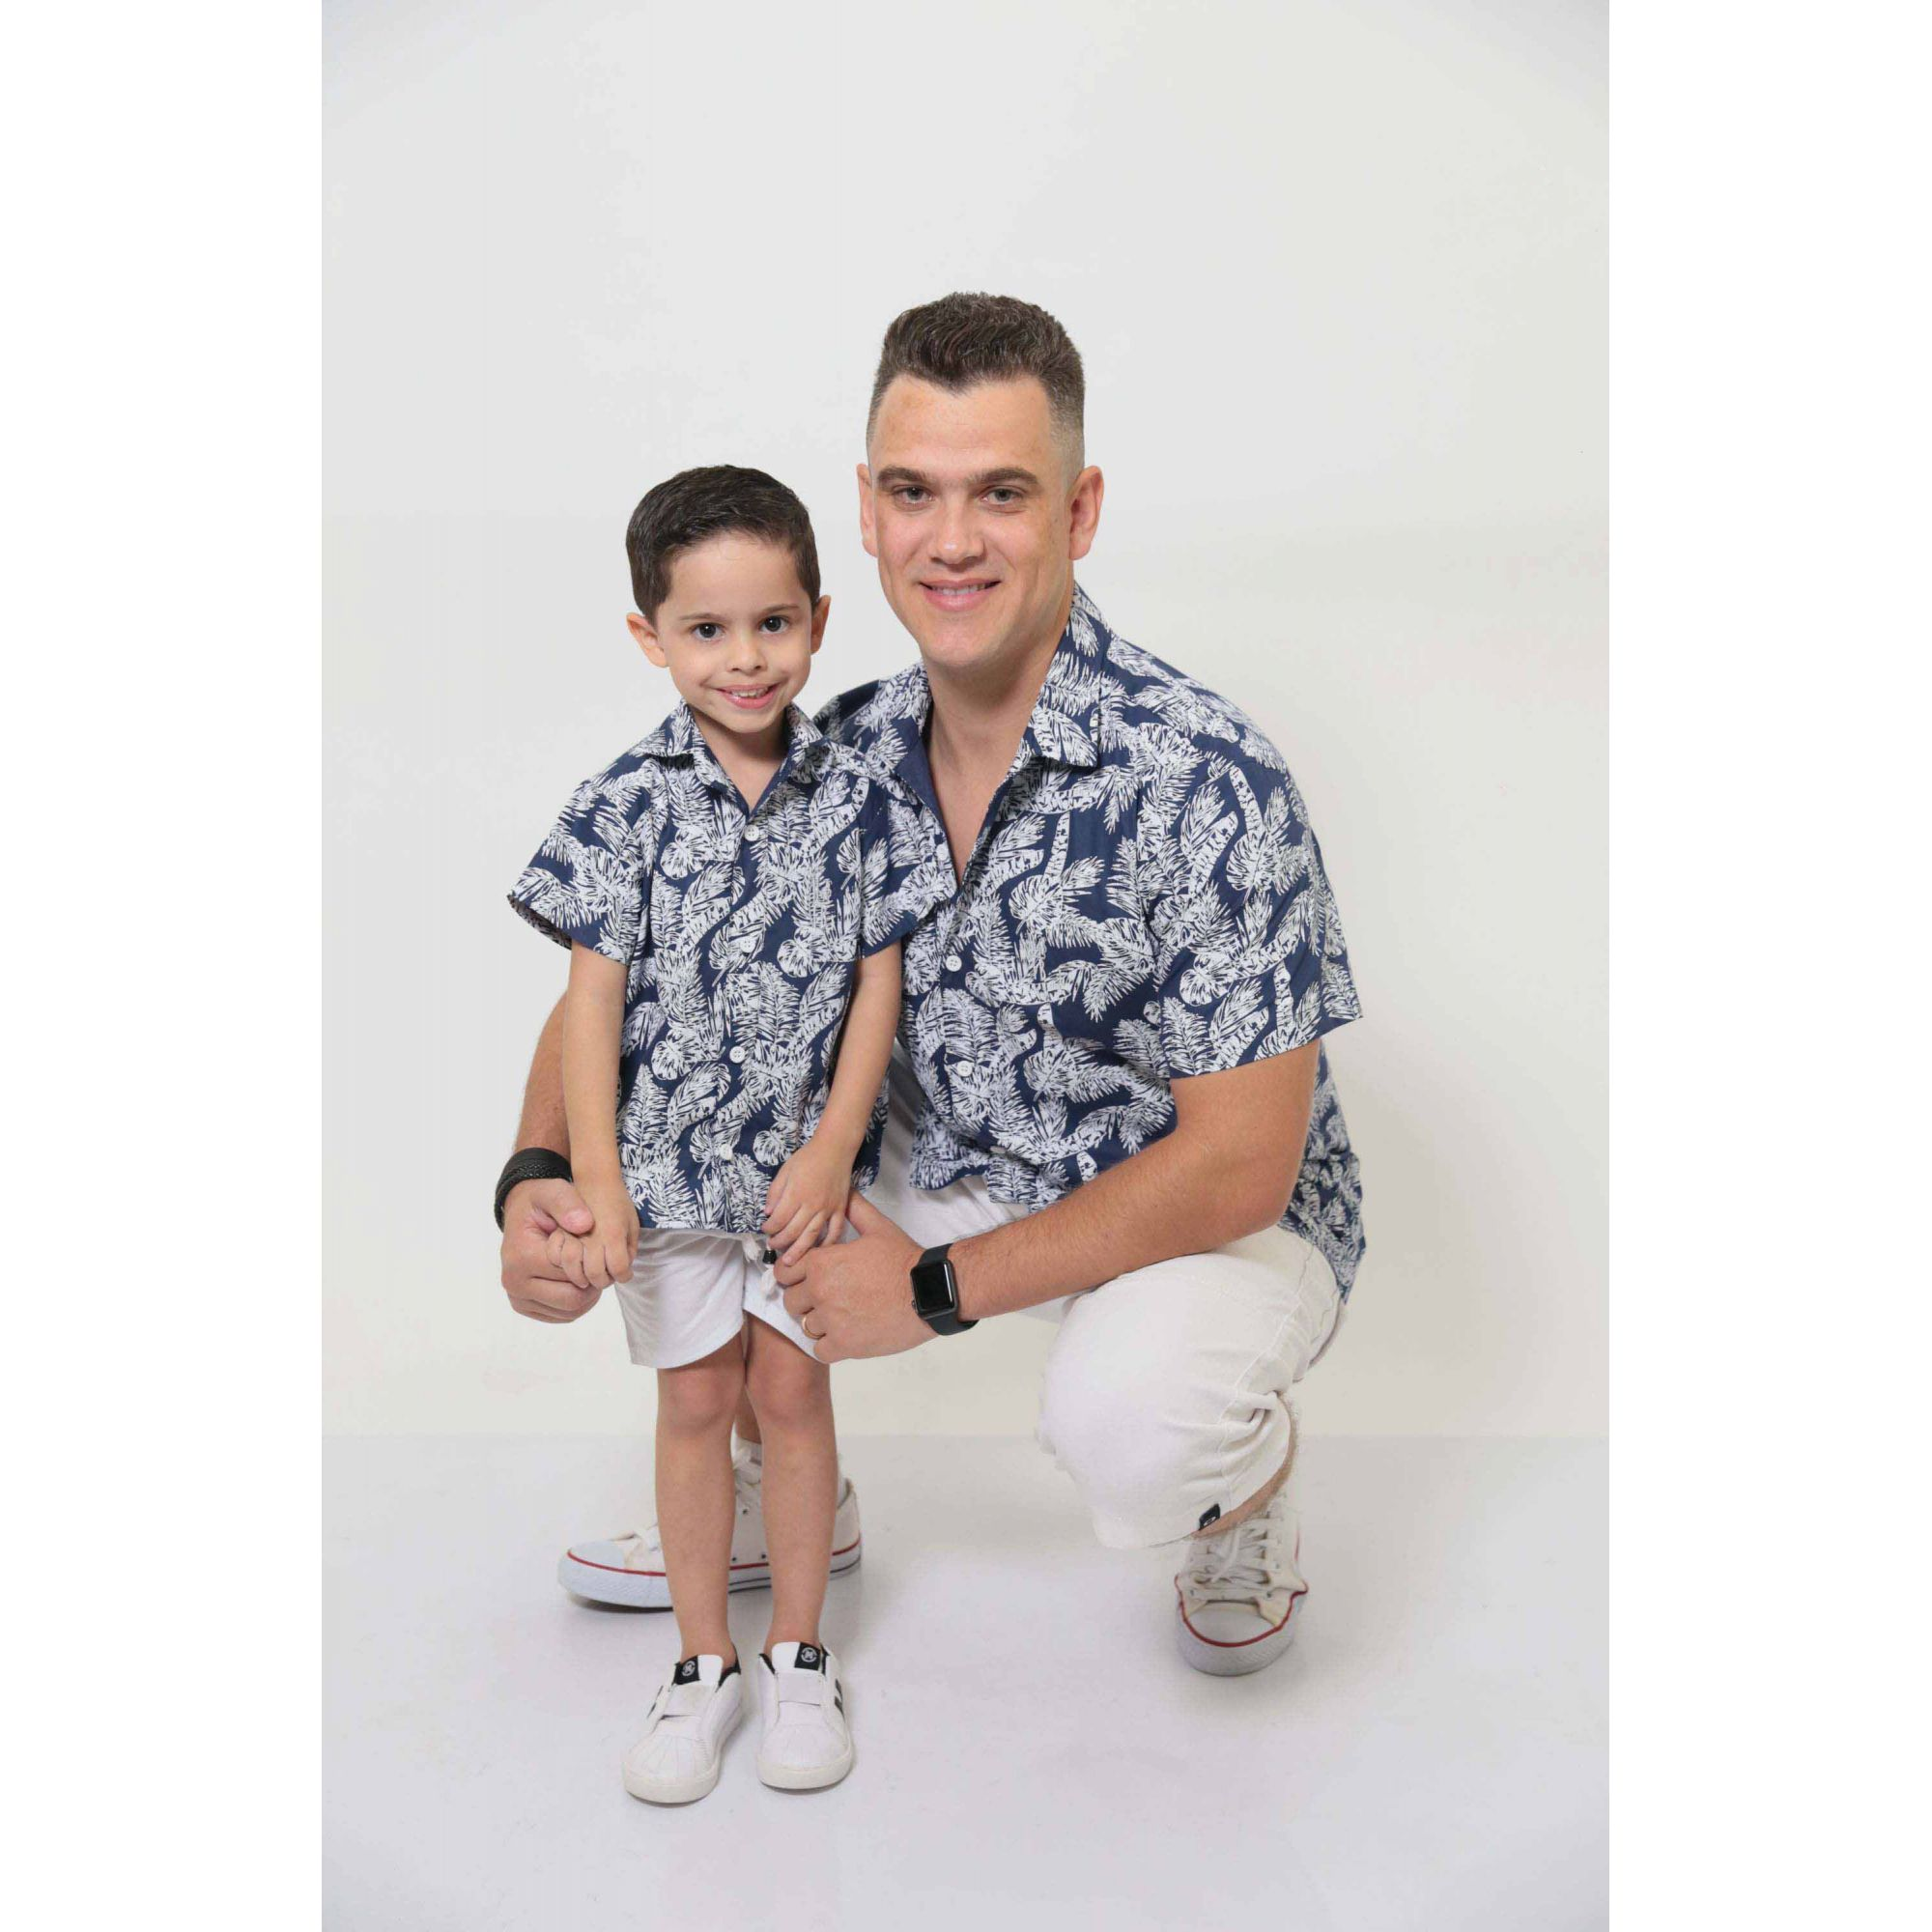 PAI E FILHO > Kit 02 Camisas Manga Curta Azul Floresta  [Coleção Tal Pai Tal Filho]  - Heitor Fashion Brazil